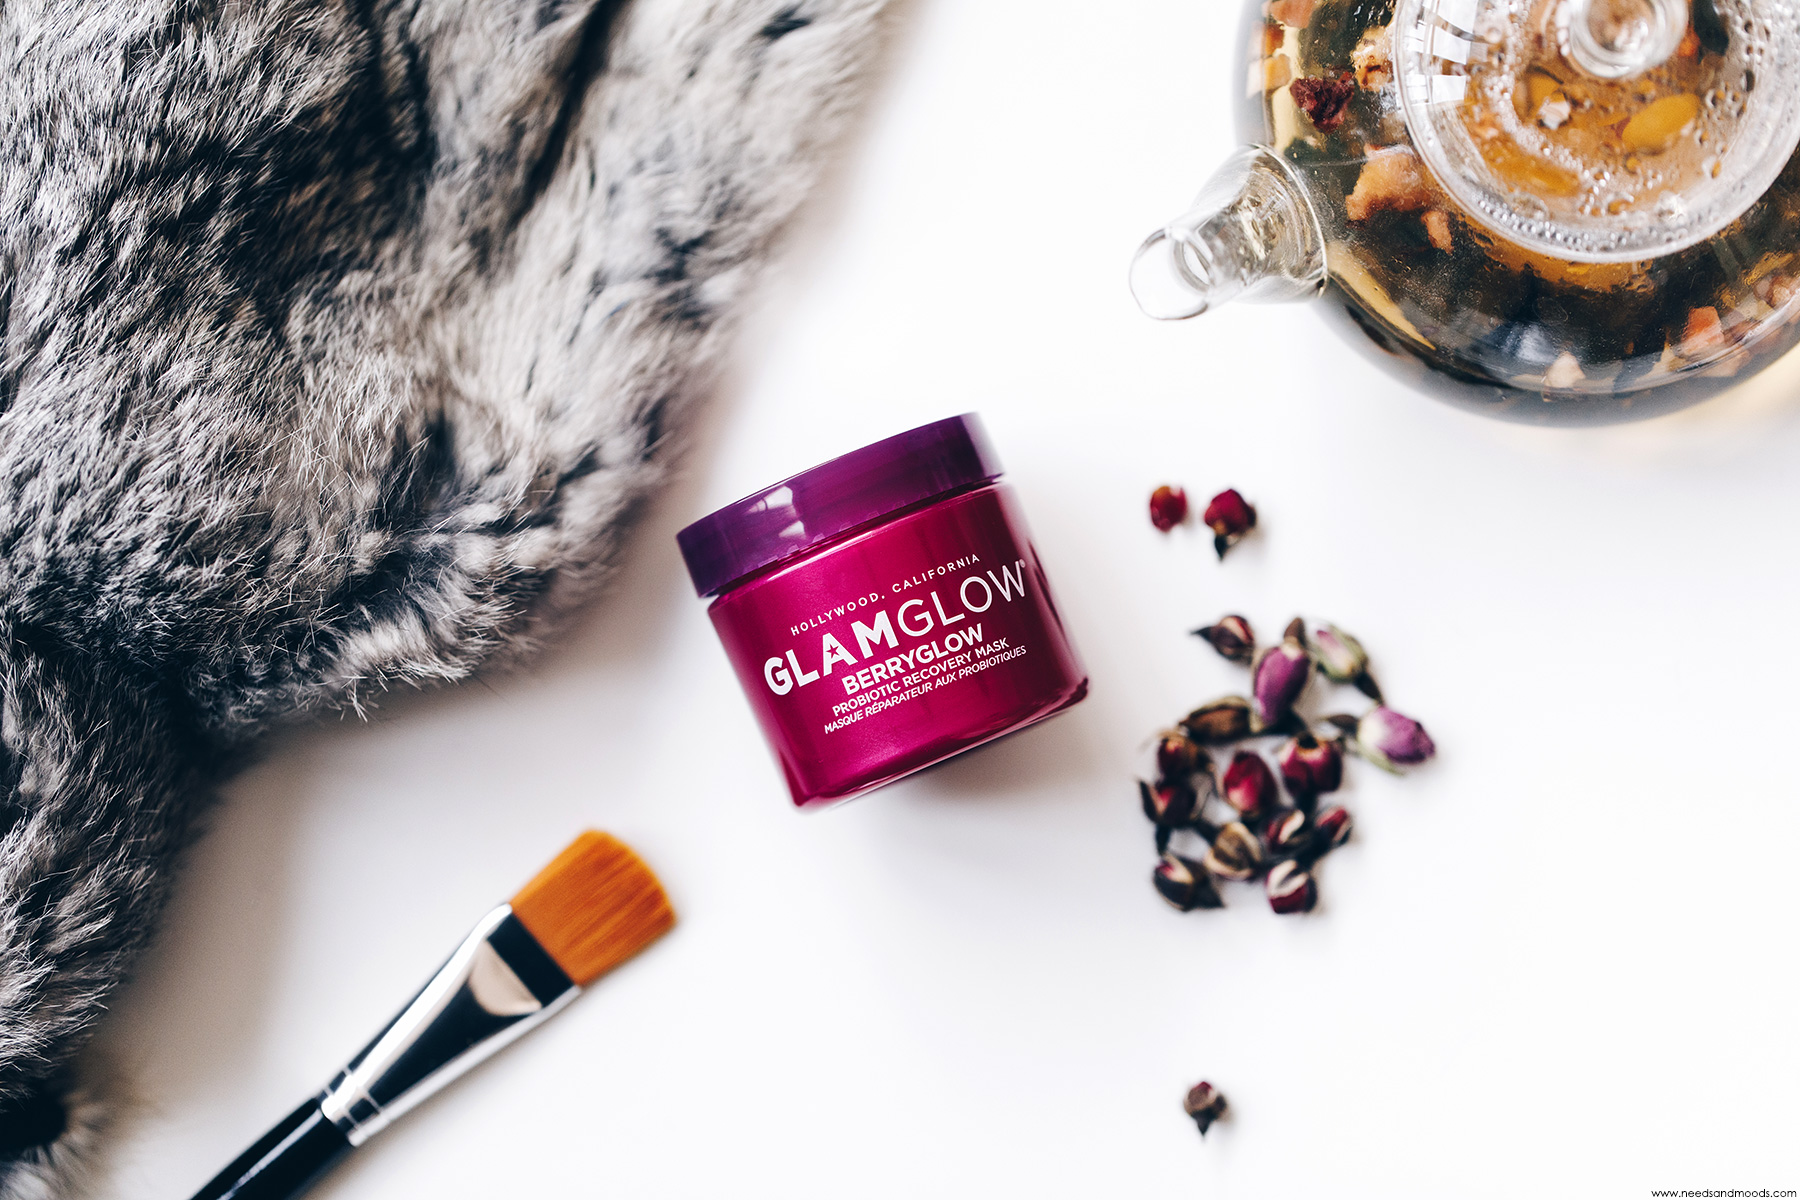 glamglow berryglow masque reparateur probiotiques